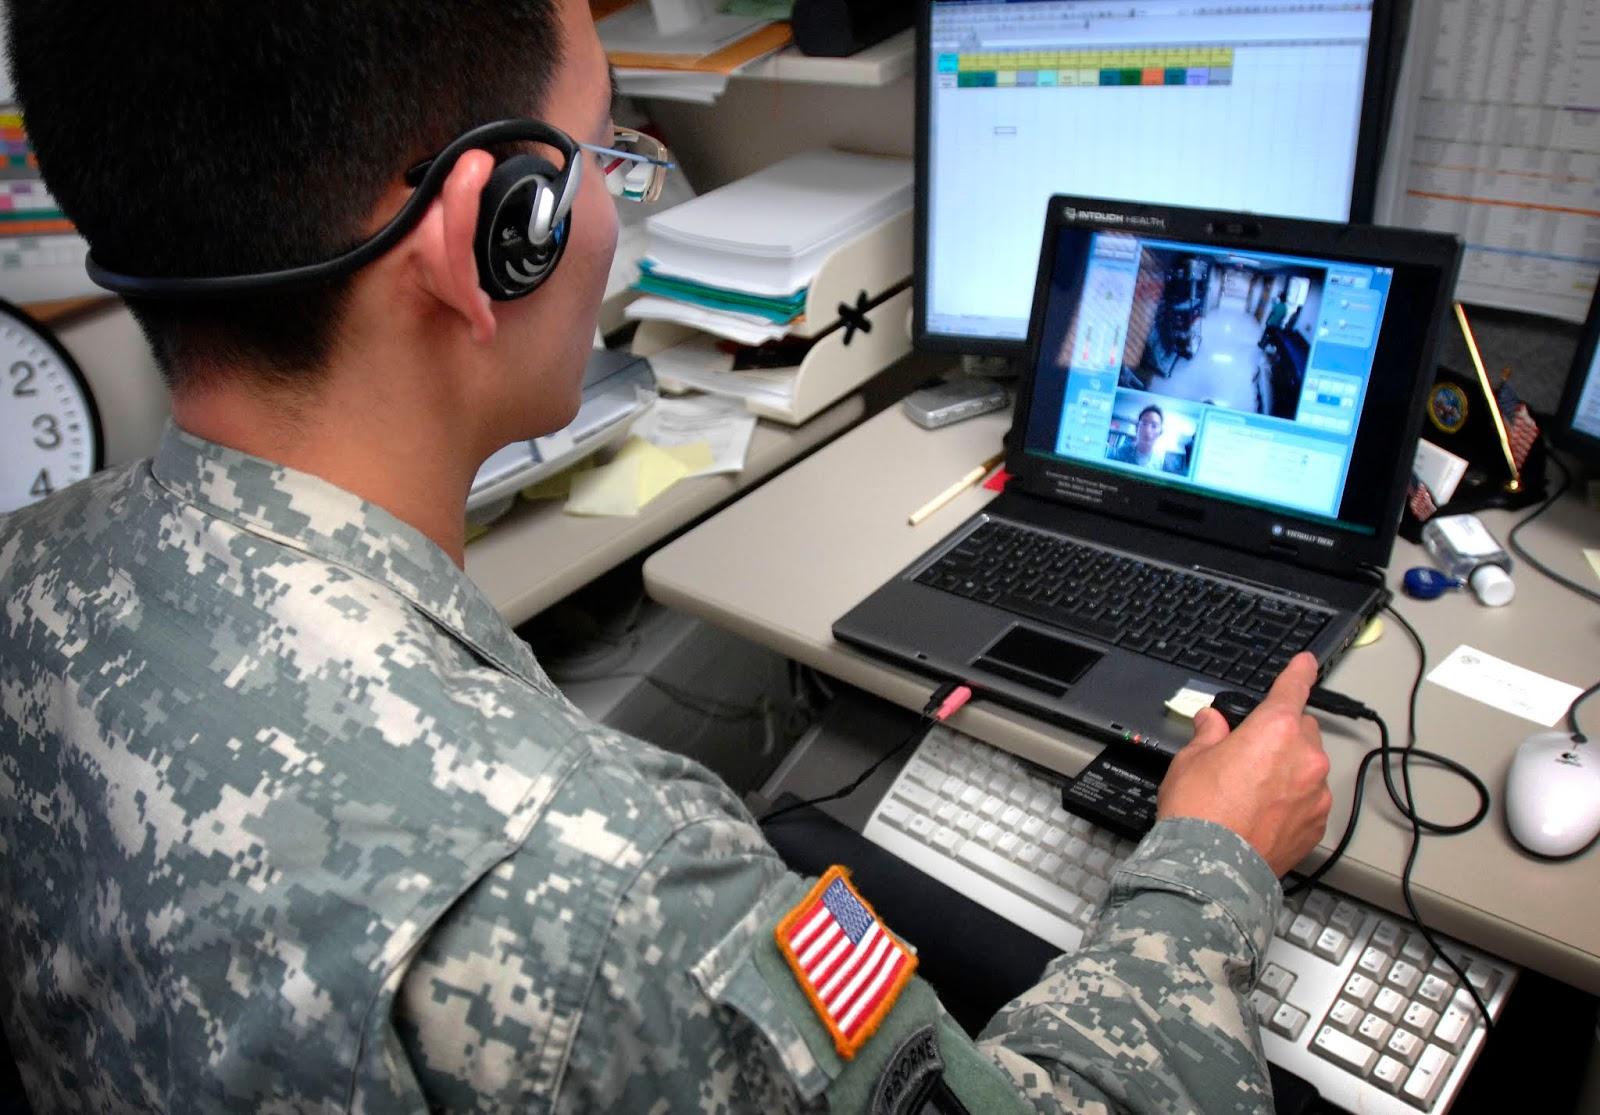 Chung operates a computer